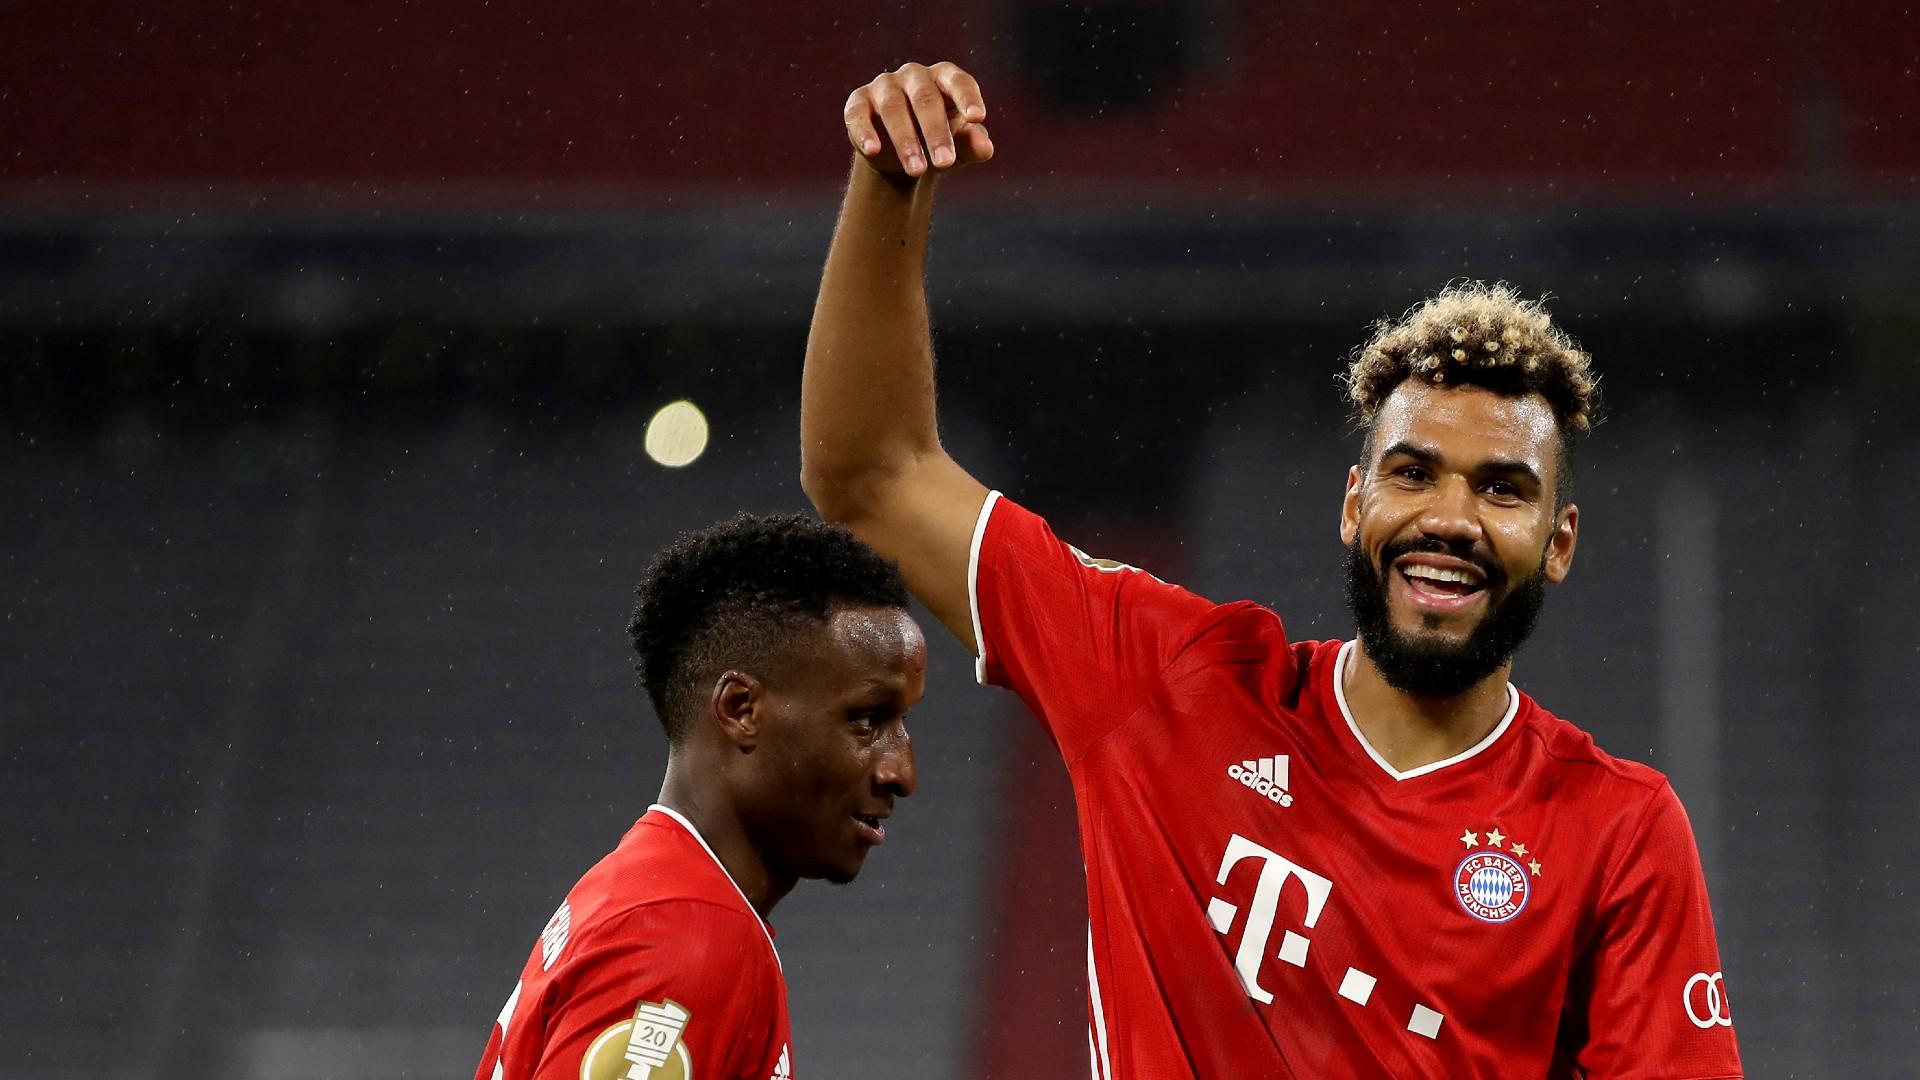 Choupo Moting Shines Arokodare Features As Bayern Munich